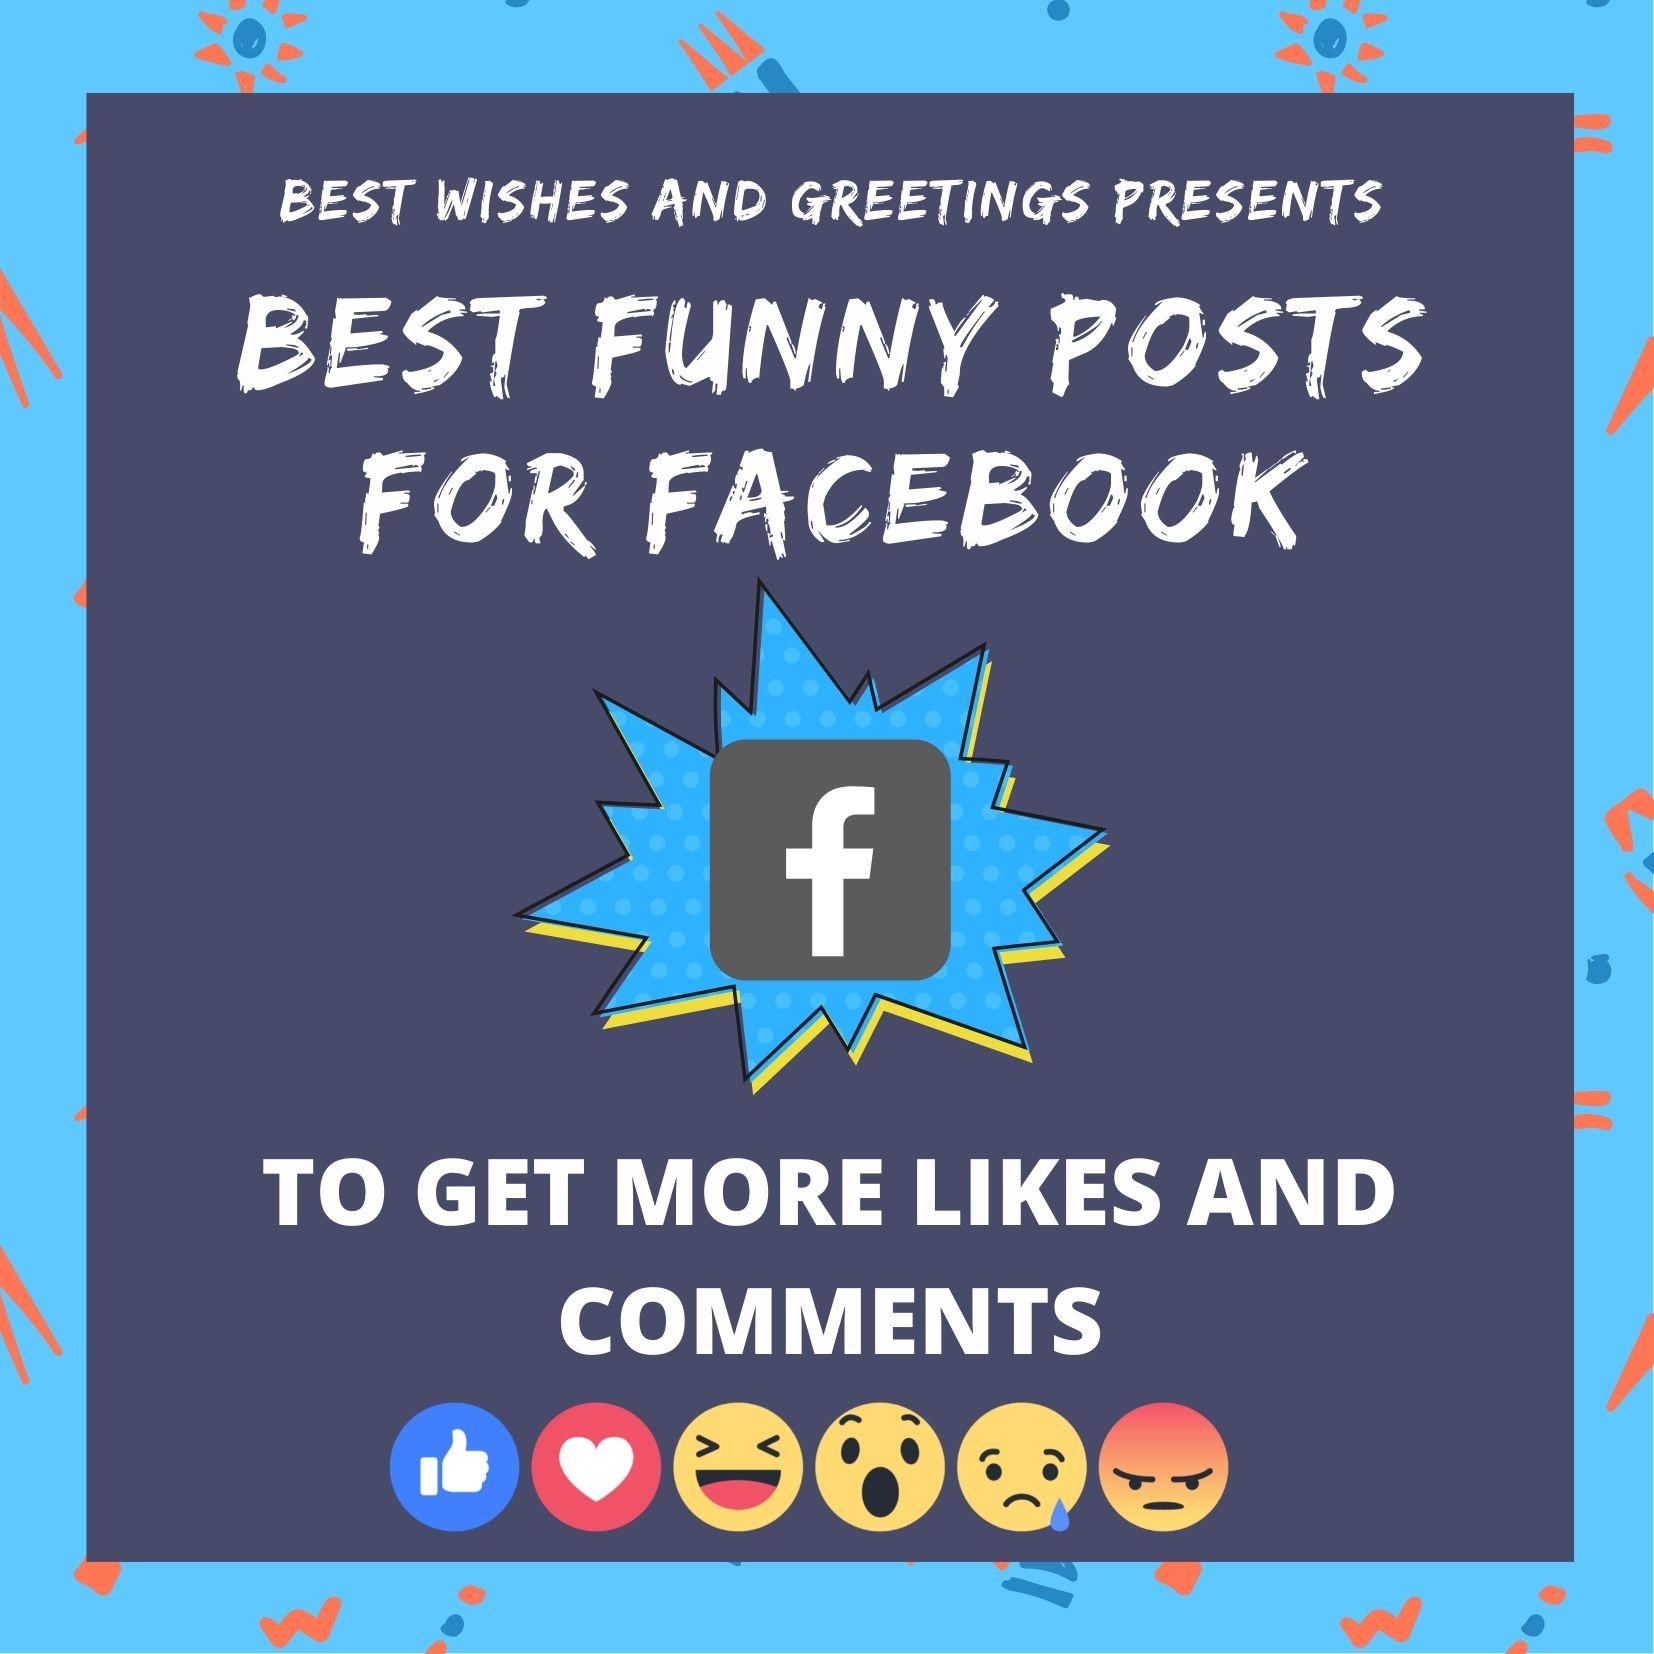 50 Best Funny Posts For Facebook